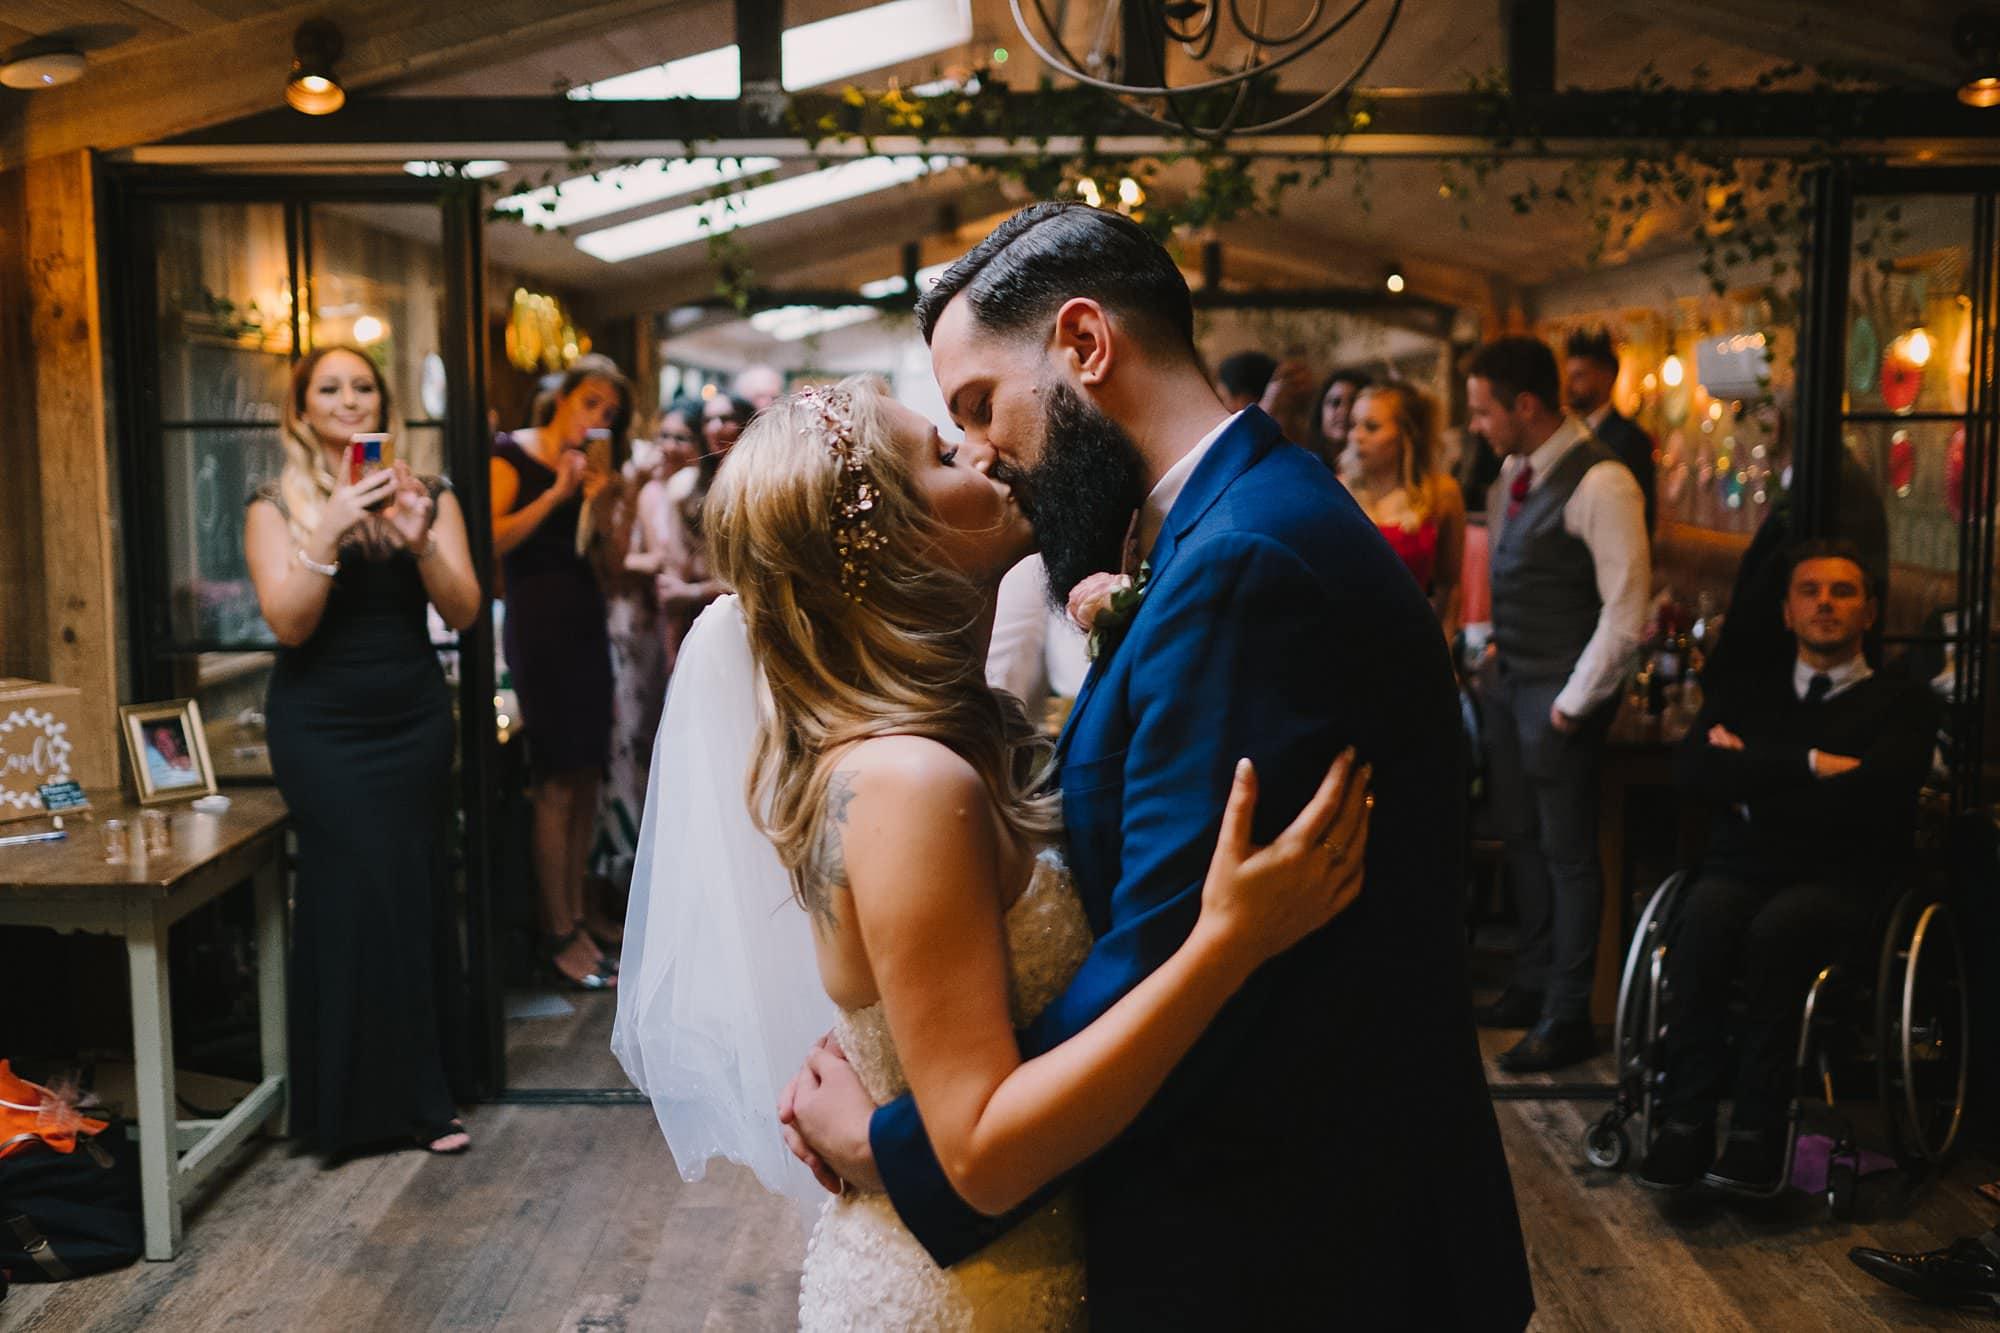 london pub wedding photographer jn 061 - The County Arms Wedding Photographer   Jen & Nick